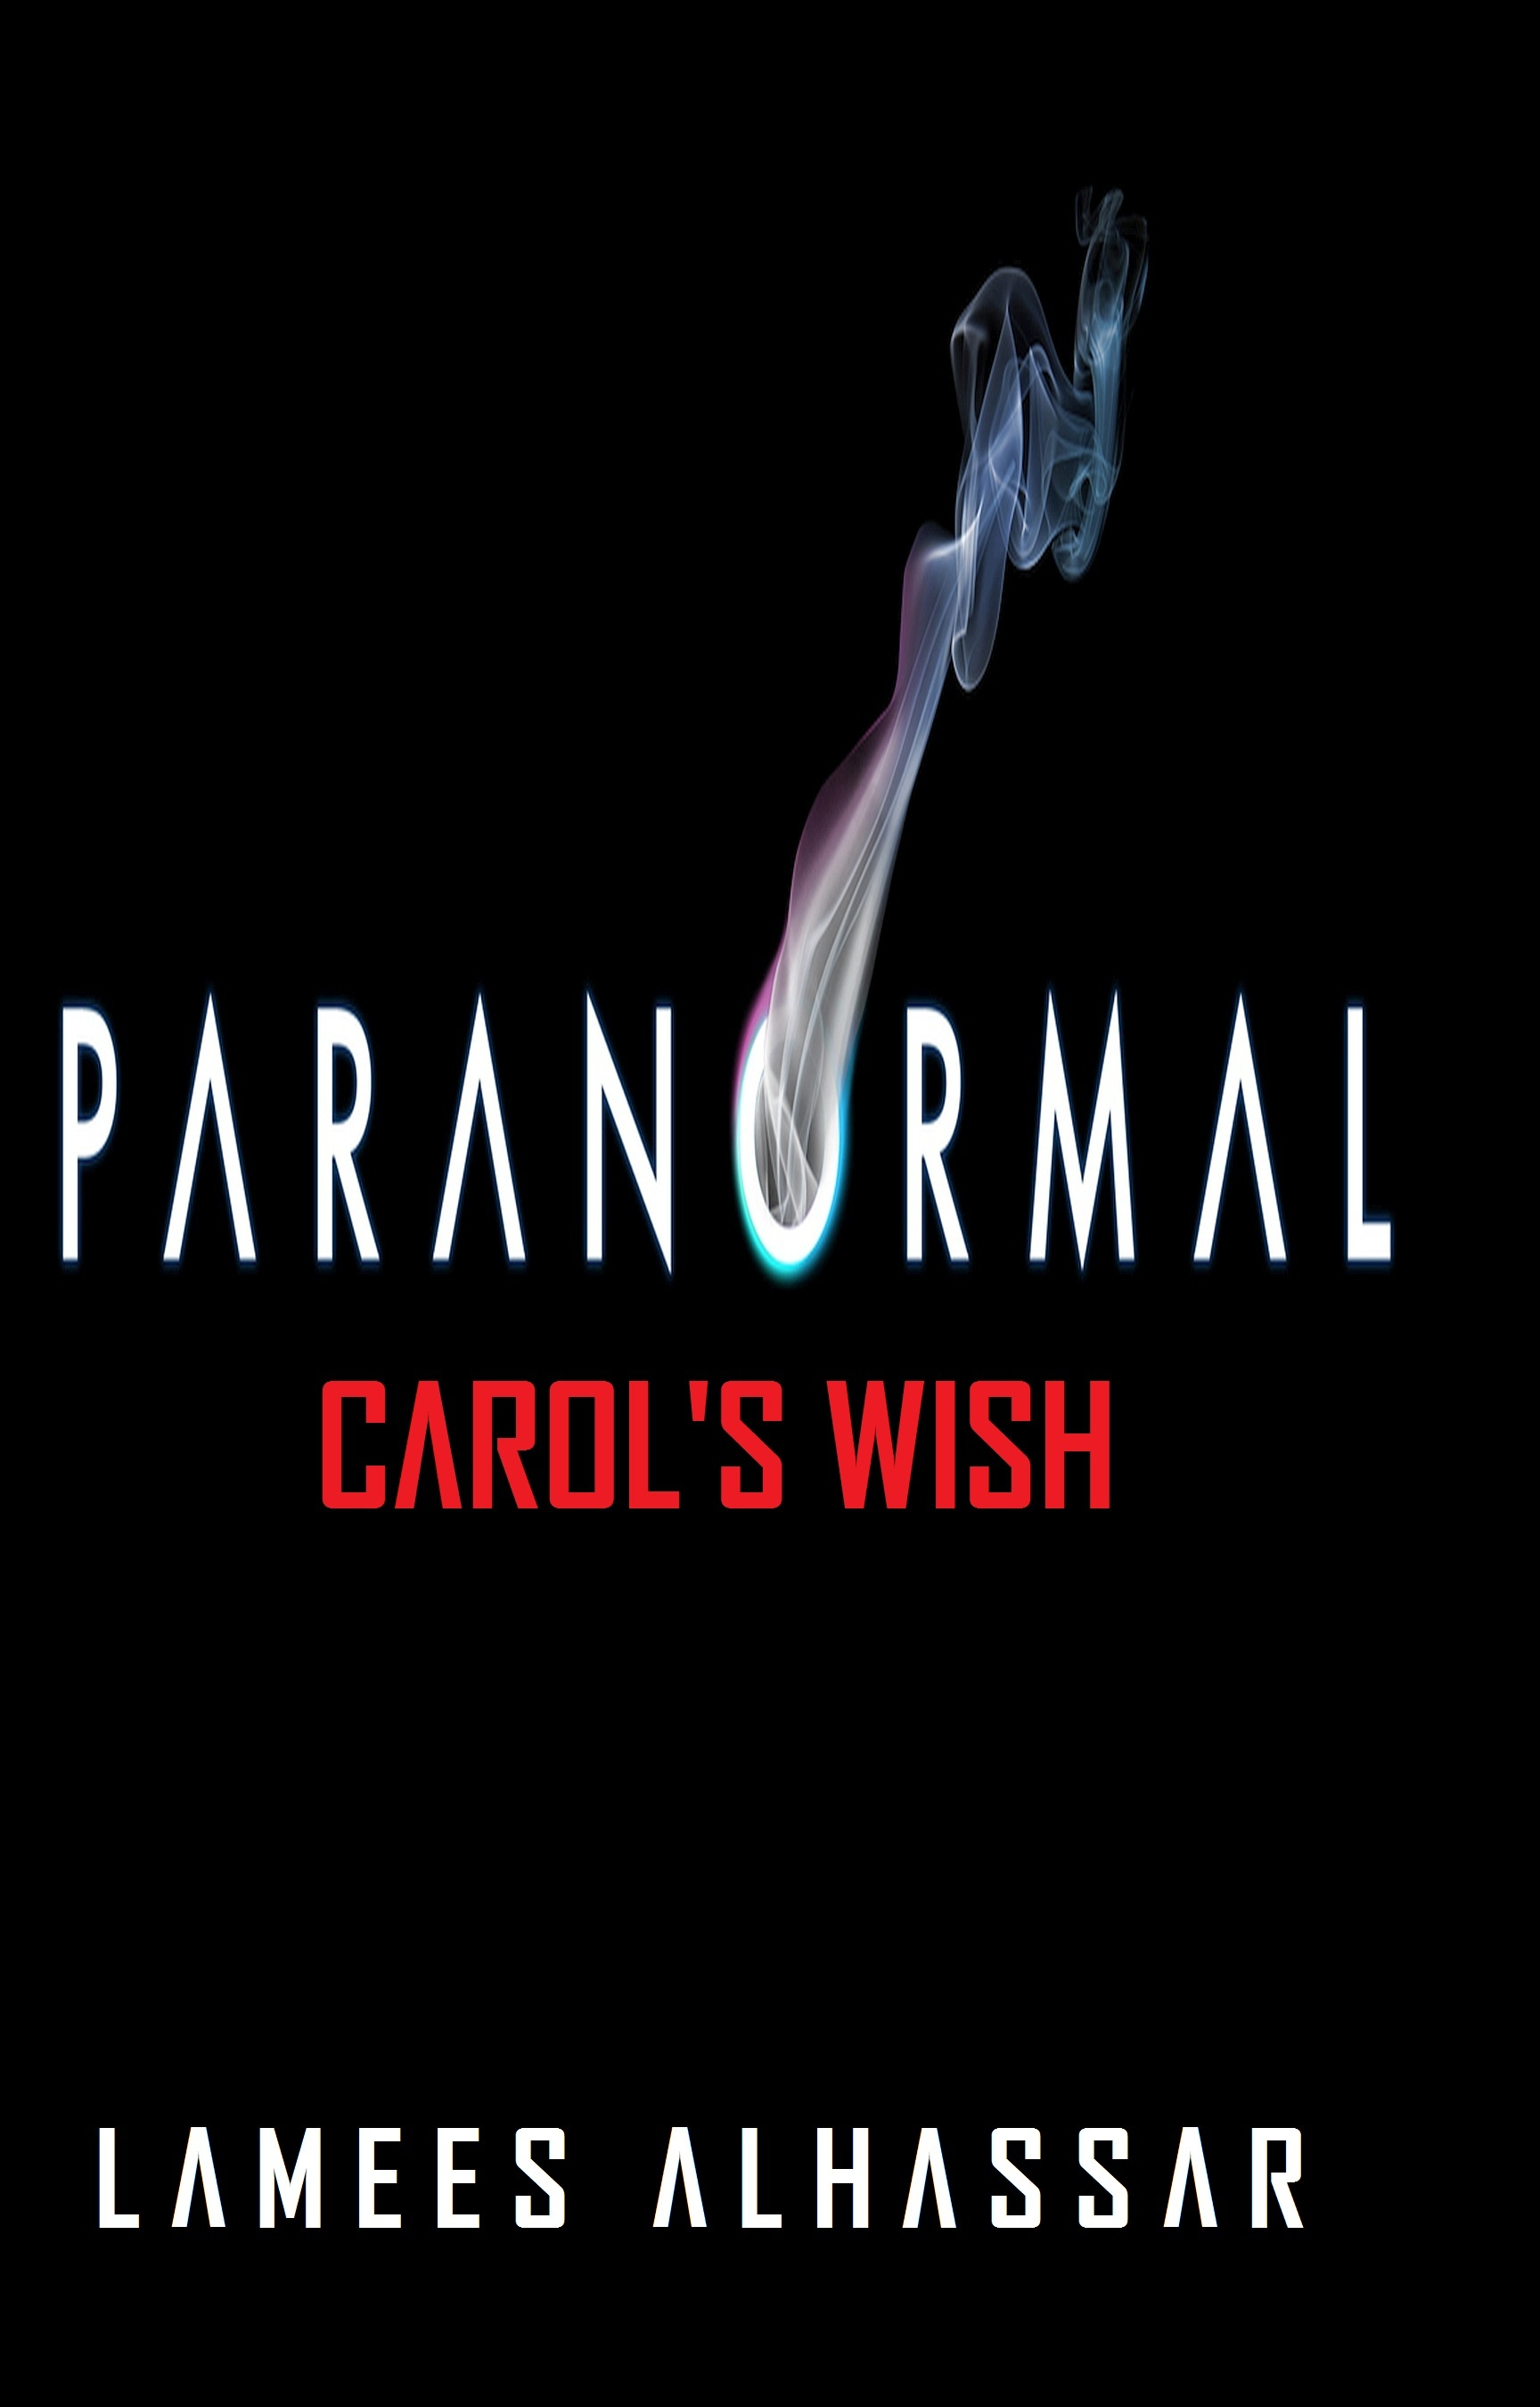 Paranormal carol's wish